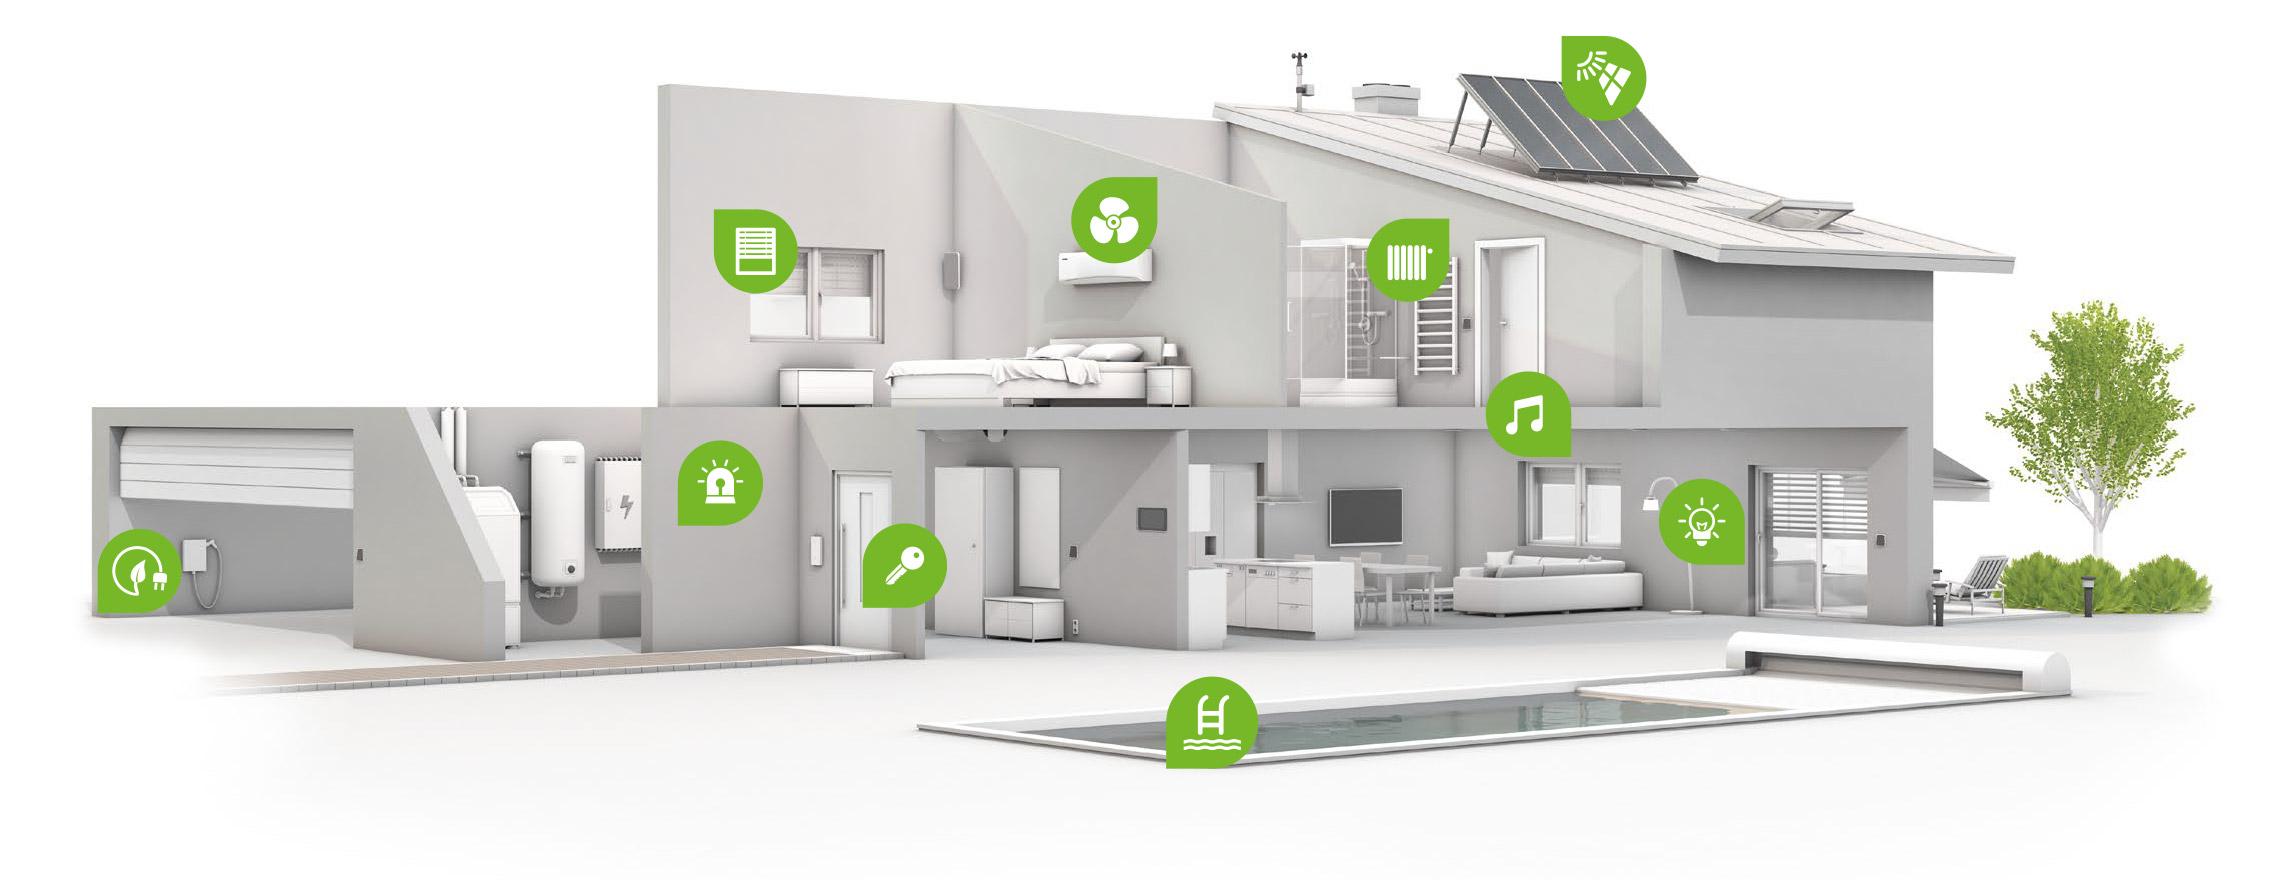 Iluminaci n sensacional para tu casa con loxone smart home - Casa de iluminacion ...